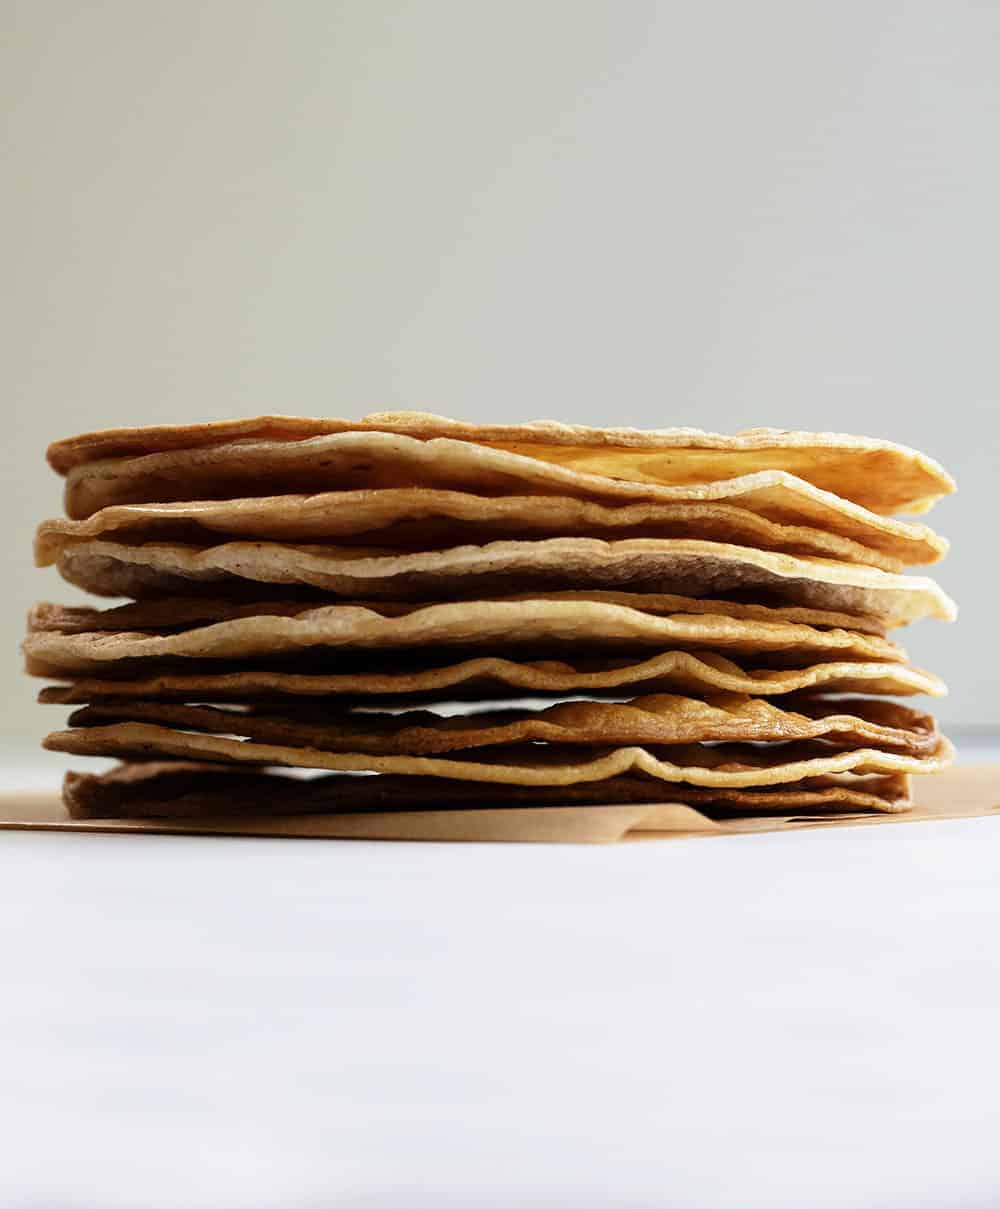 tostada shells stacked